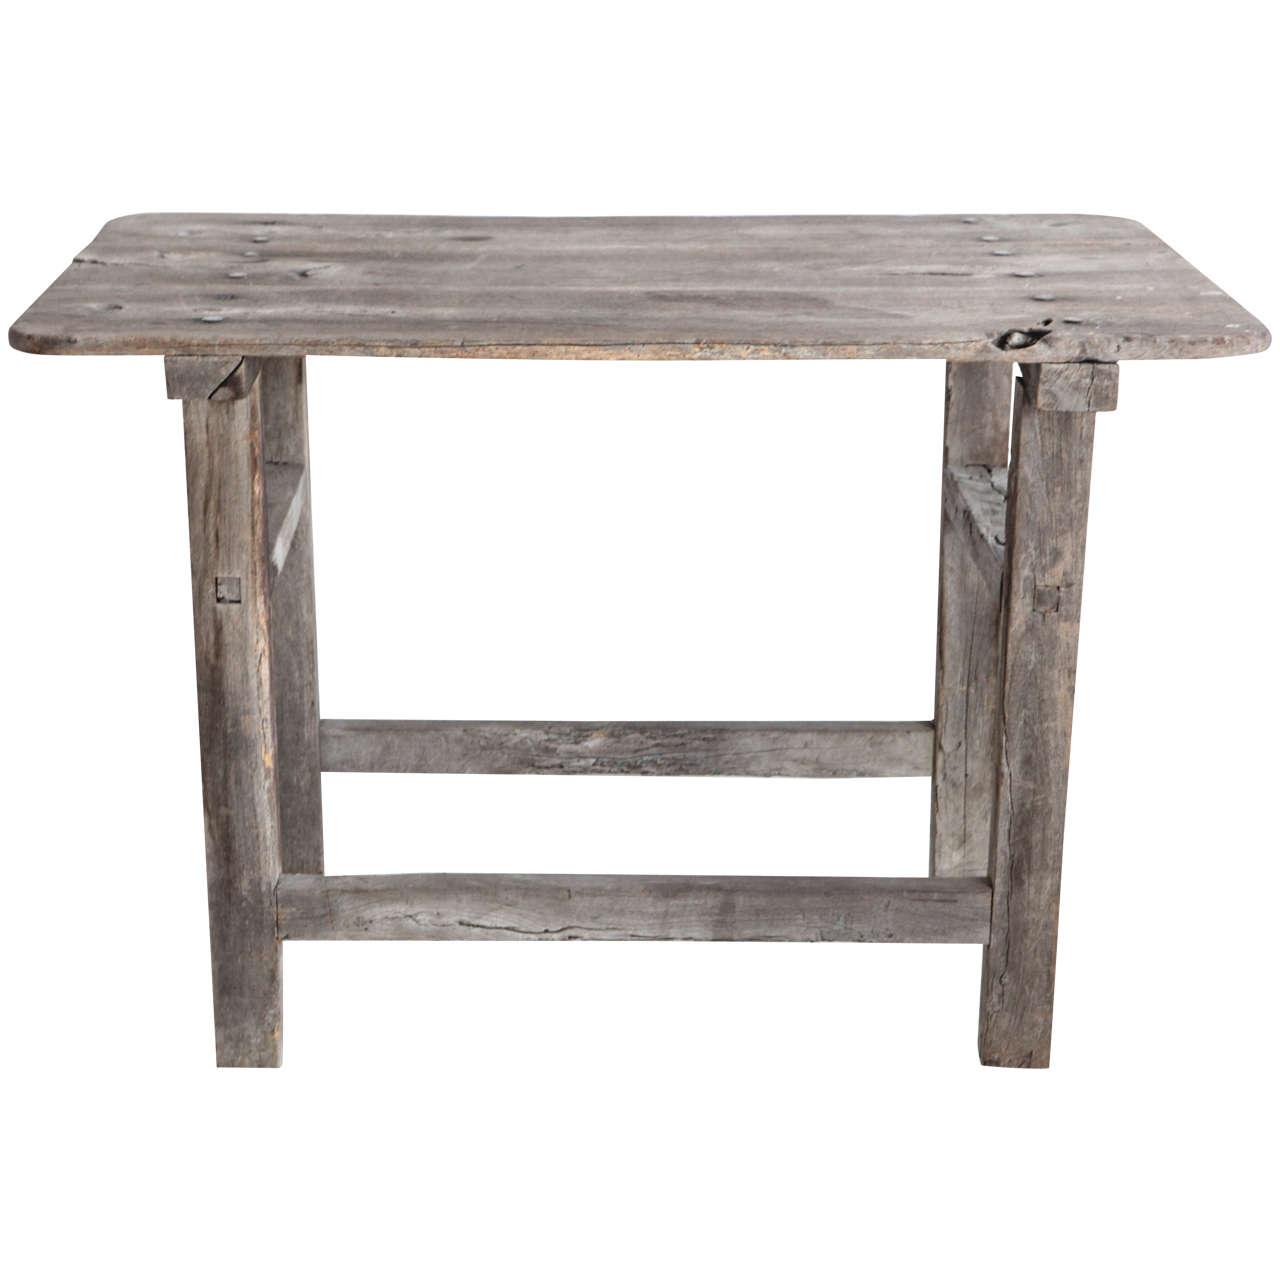 Rustic grey wash bar table at 1stdibs rustic grey wash bar table 1 geotapseo Images